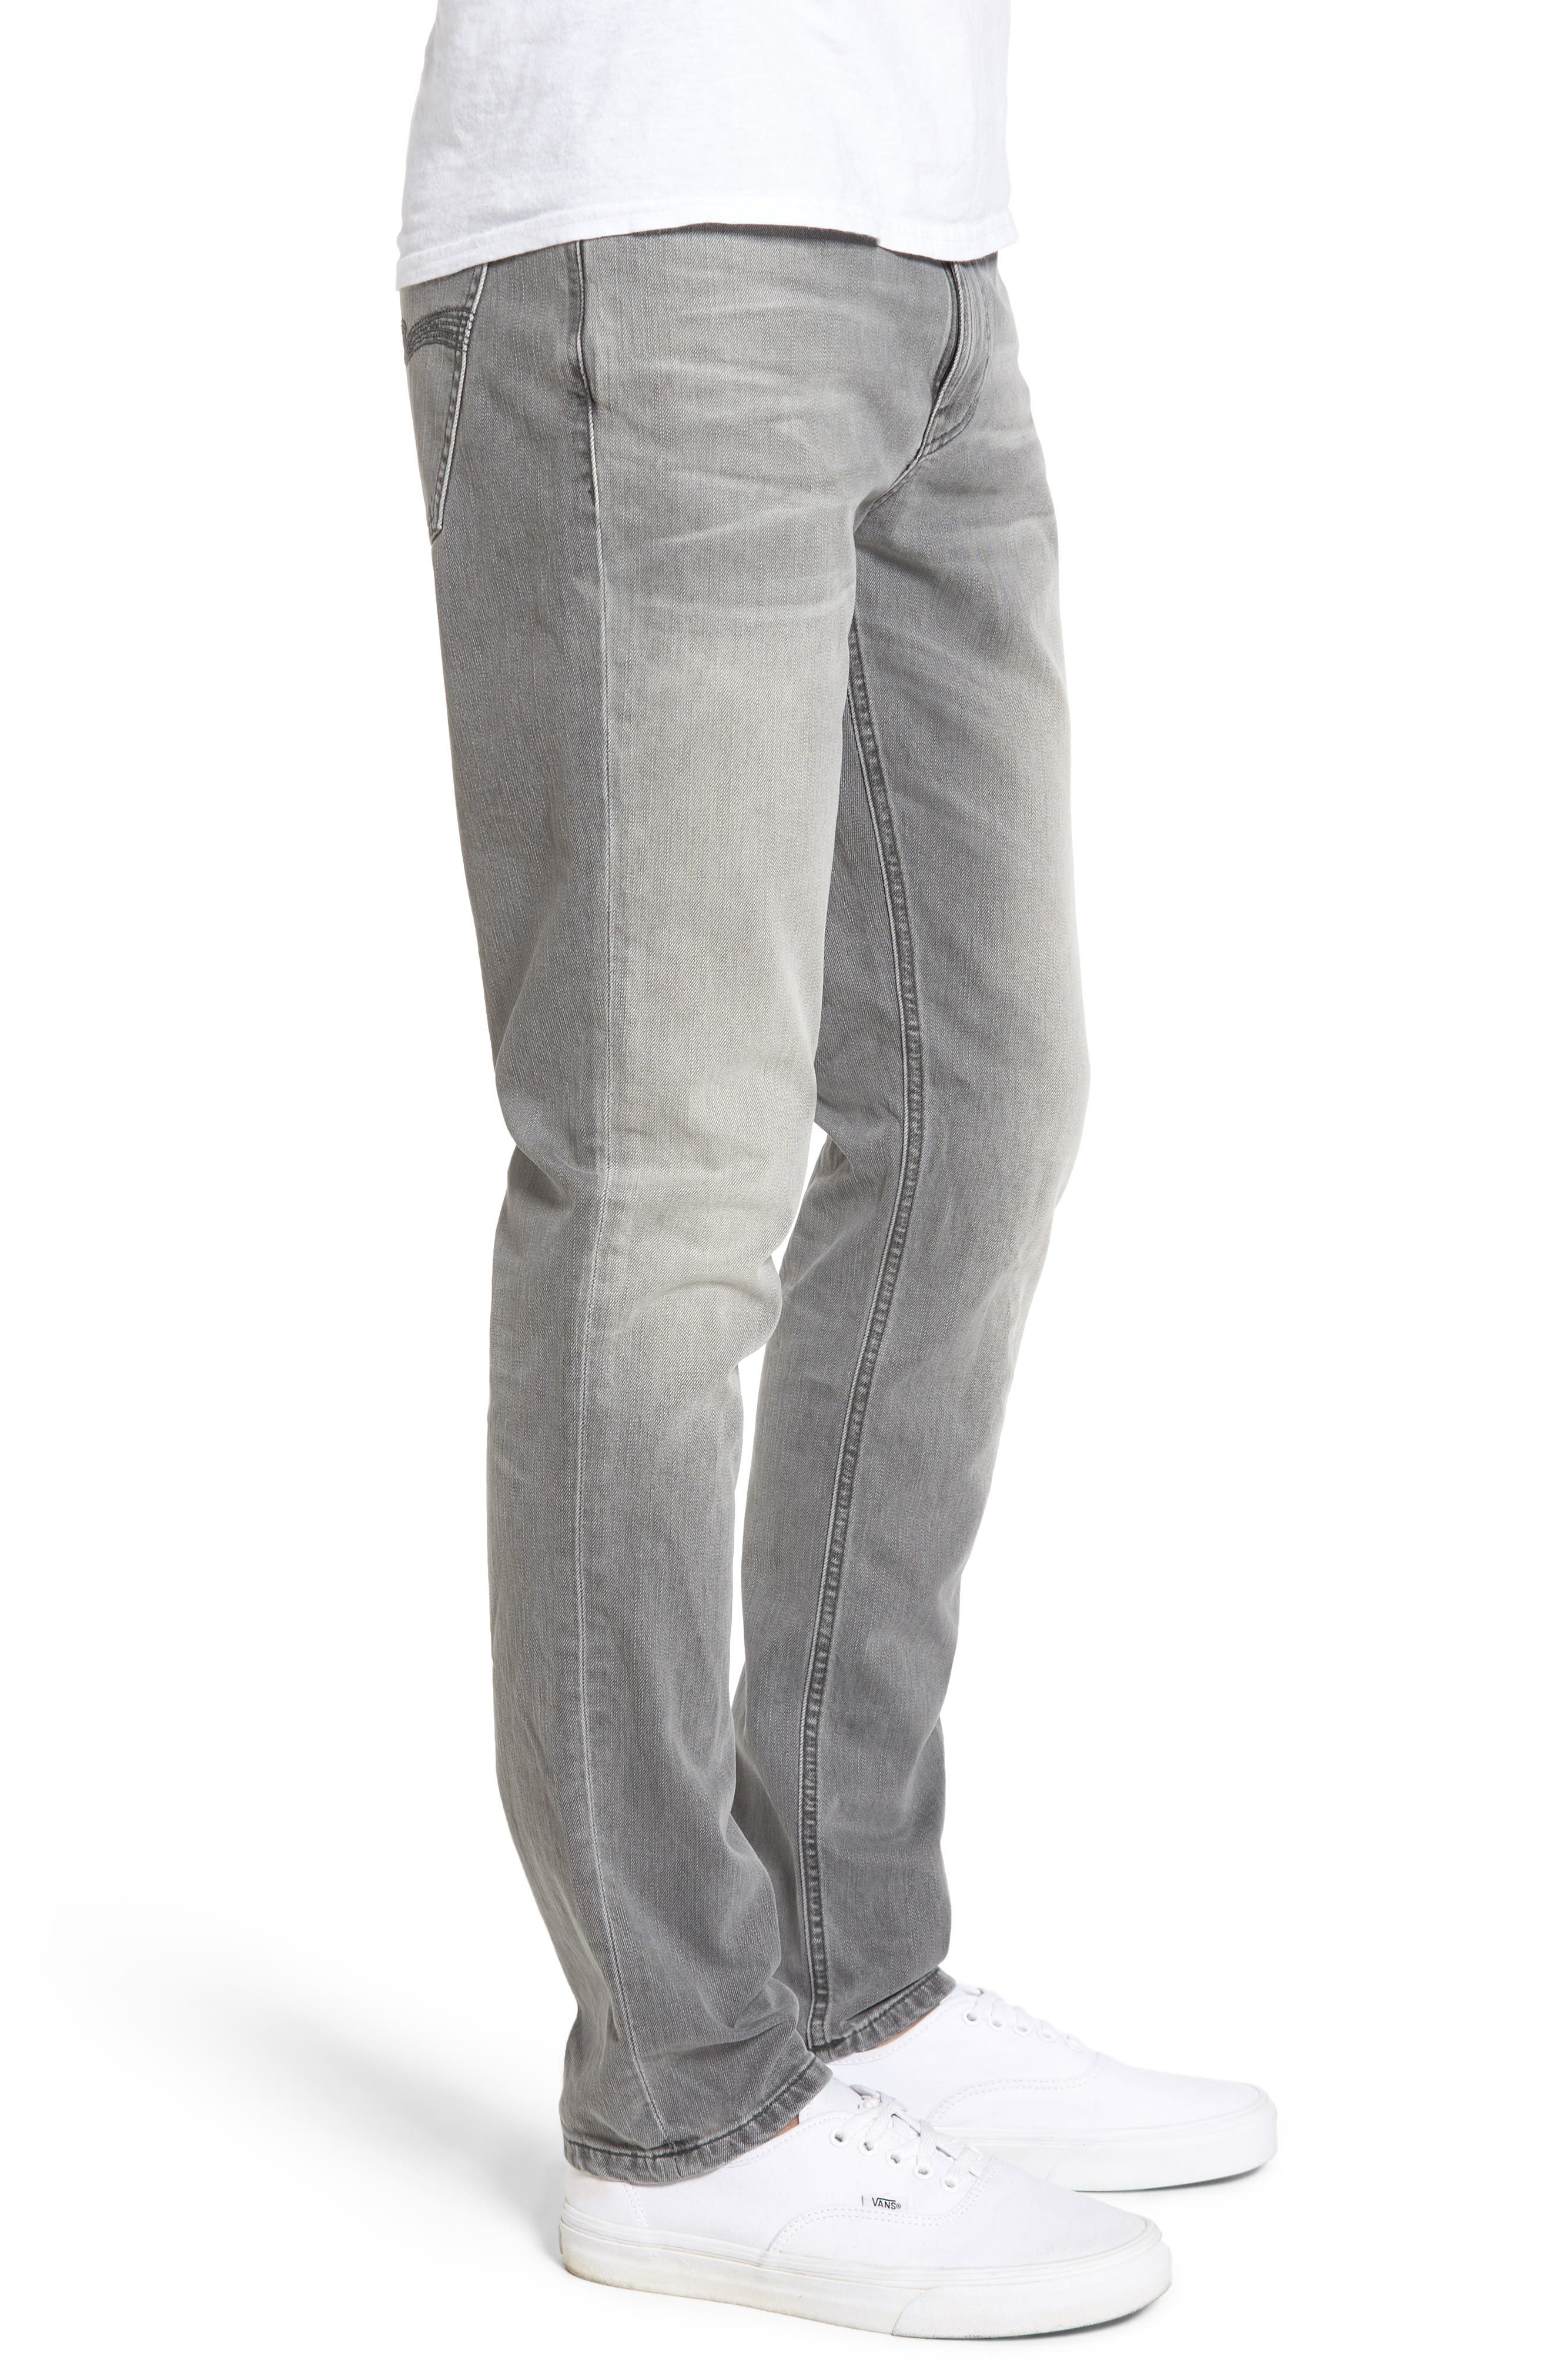 Lean Dean Slouchy Skinny Fit Jeans,                             Alternate thumbnail 3, color,                             060